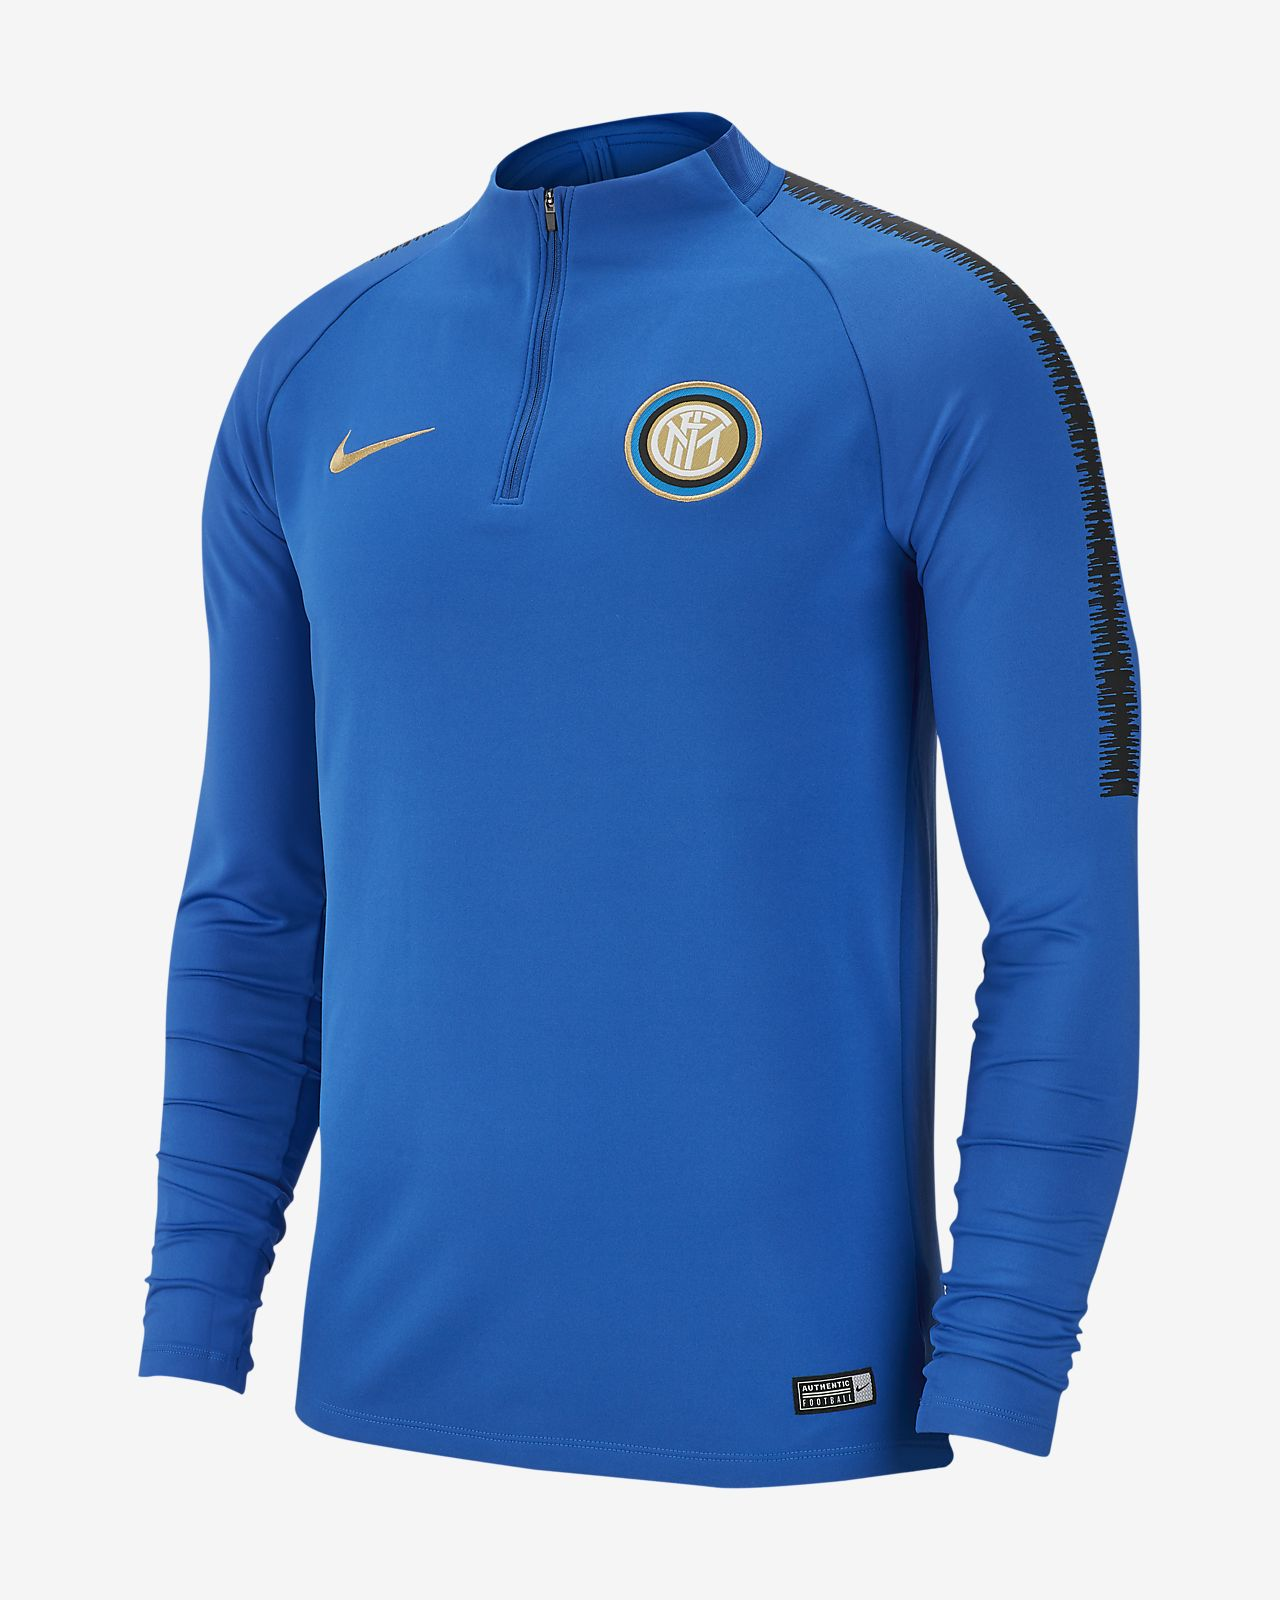 6fedd791153a Inter Milan Dri-FIT Squad Drill Men s Long-Sleeve Football Top. Nike ...